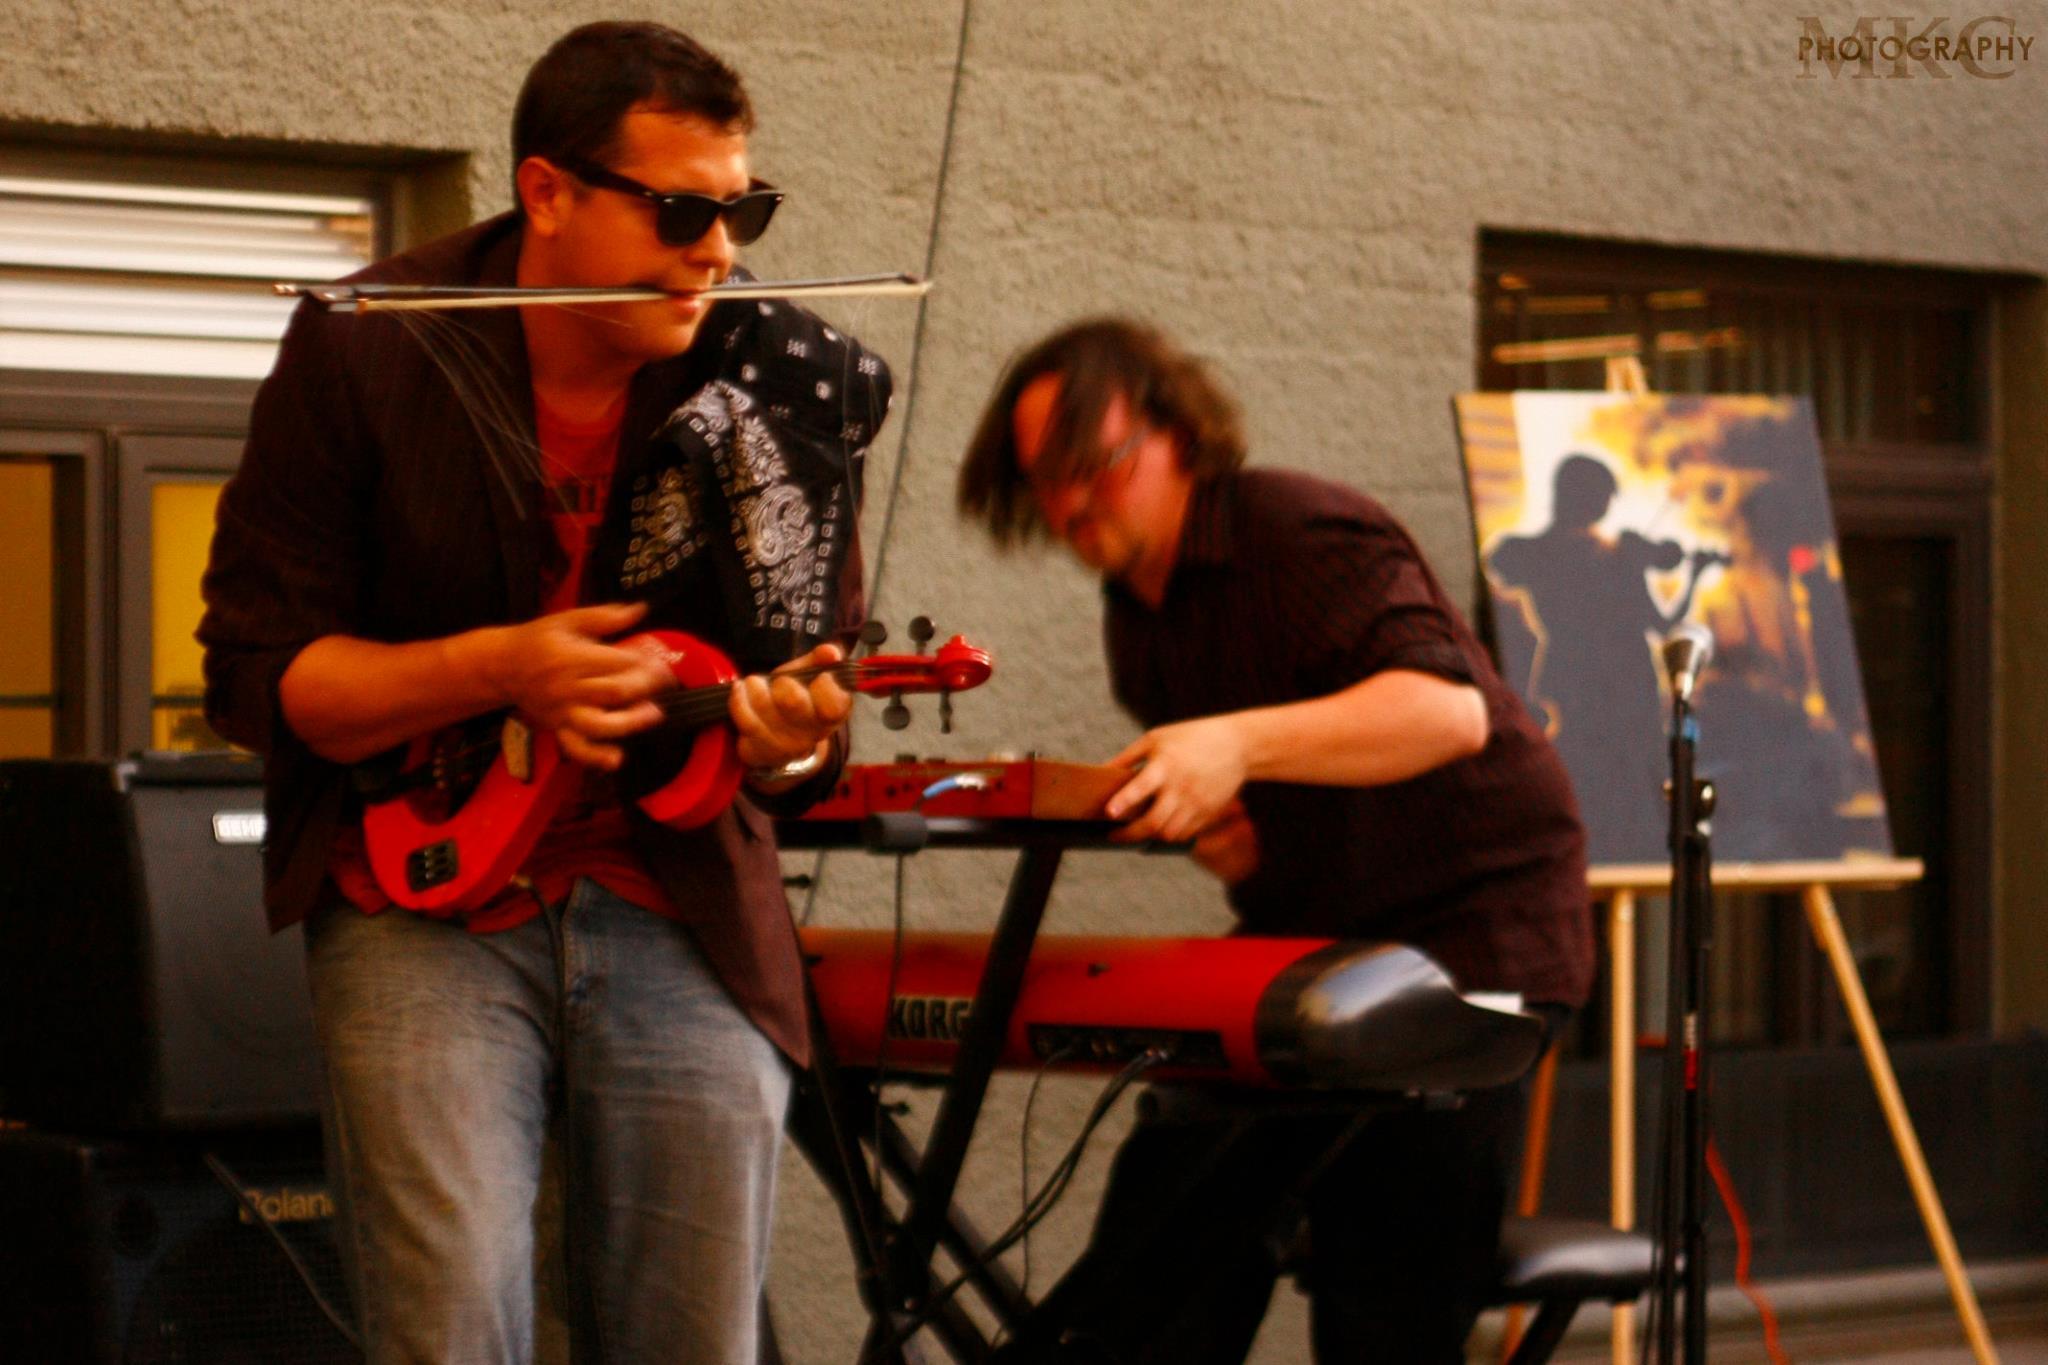 Patrick Contreras and Jay Smith